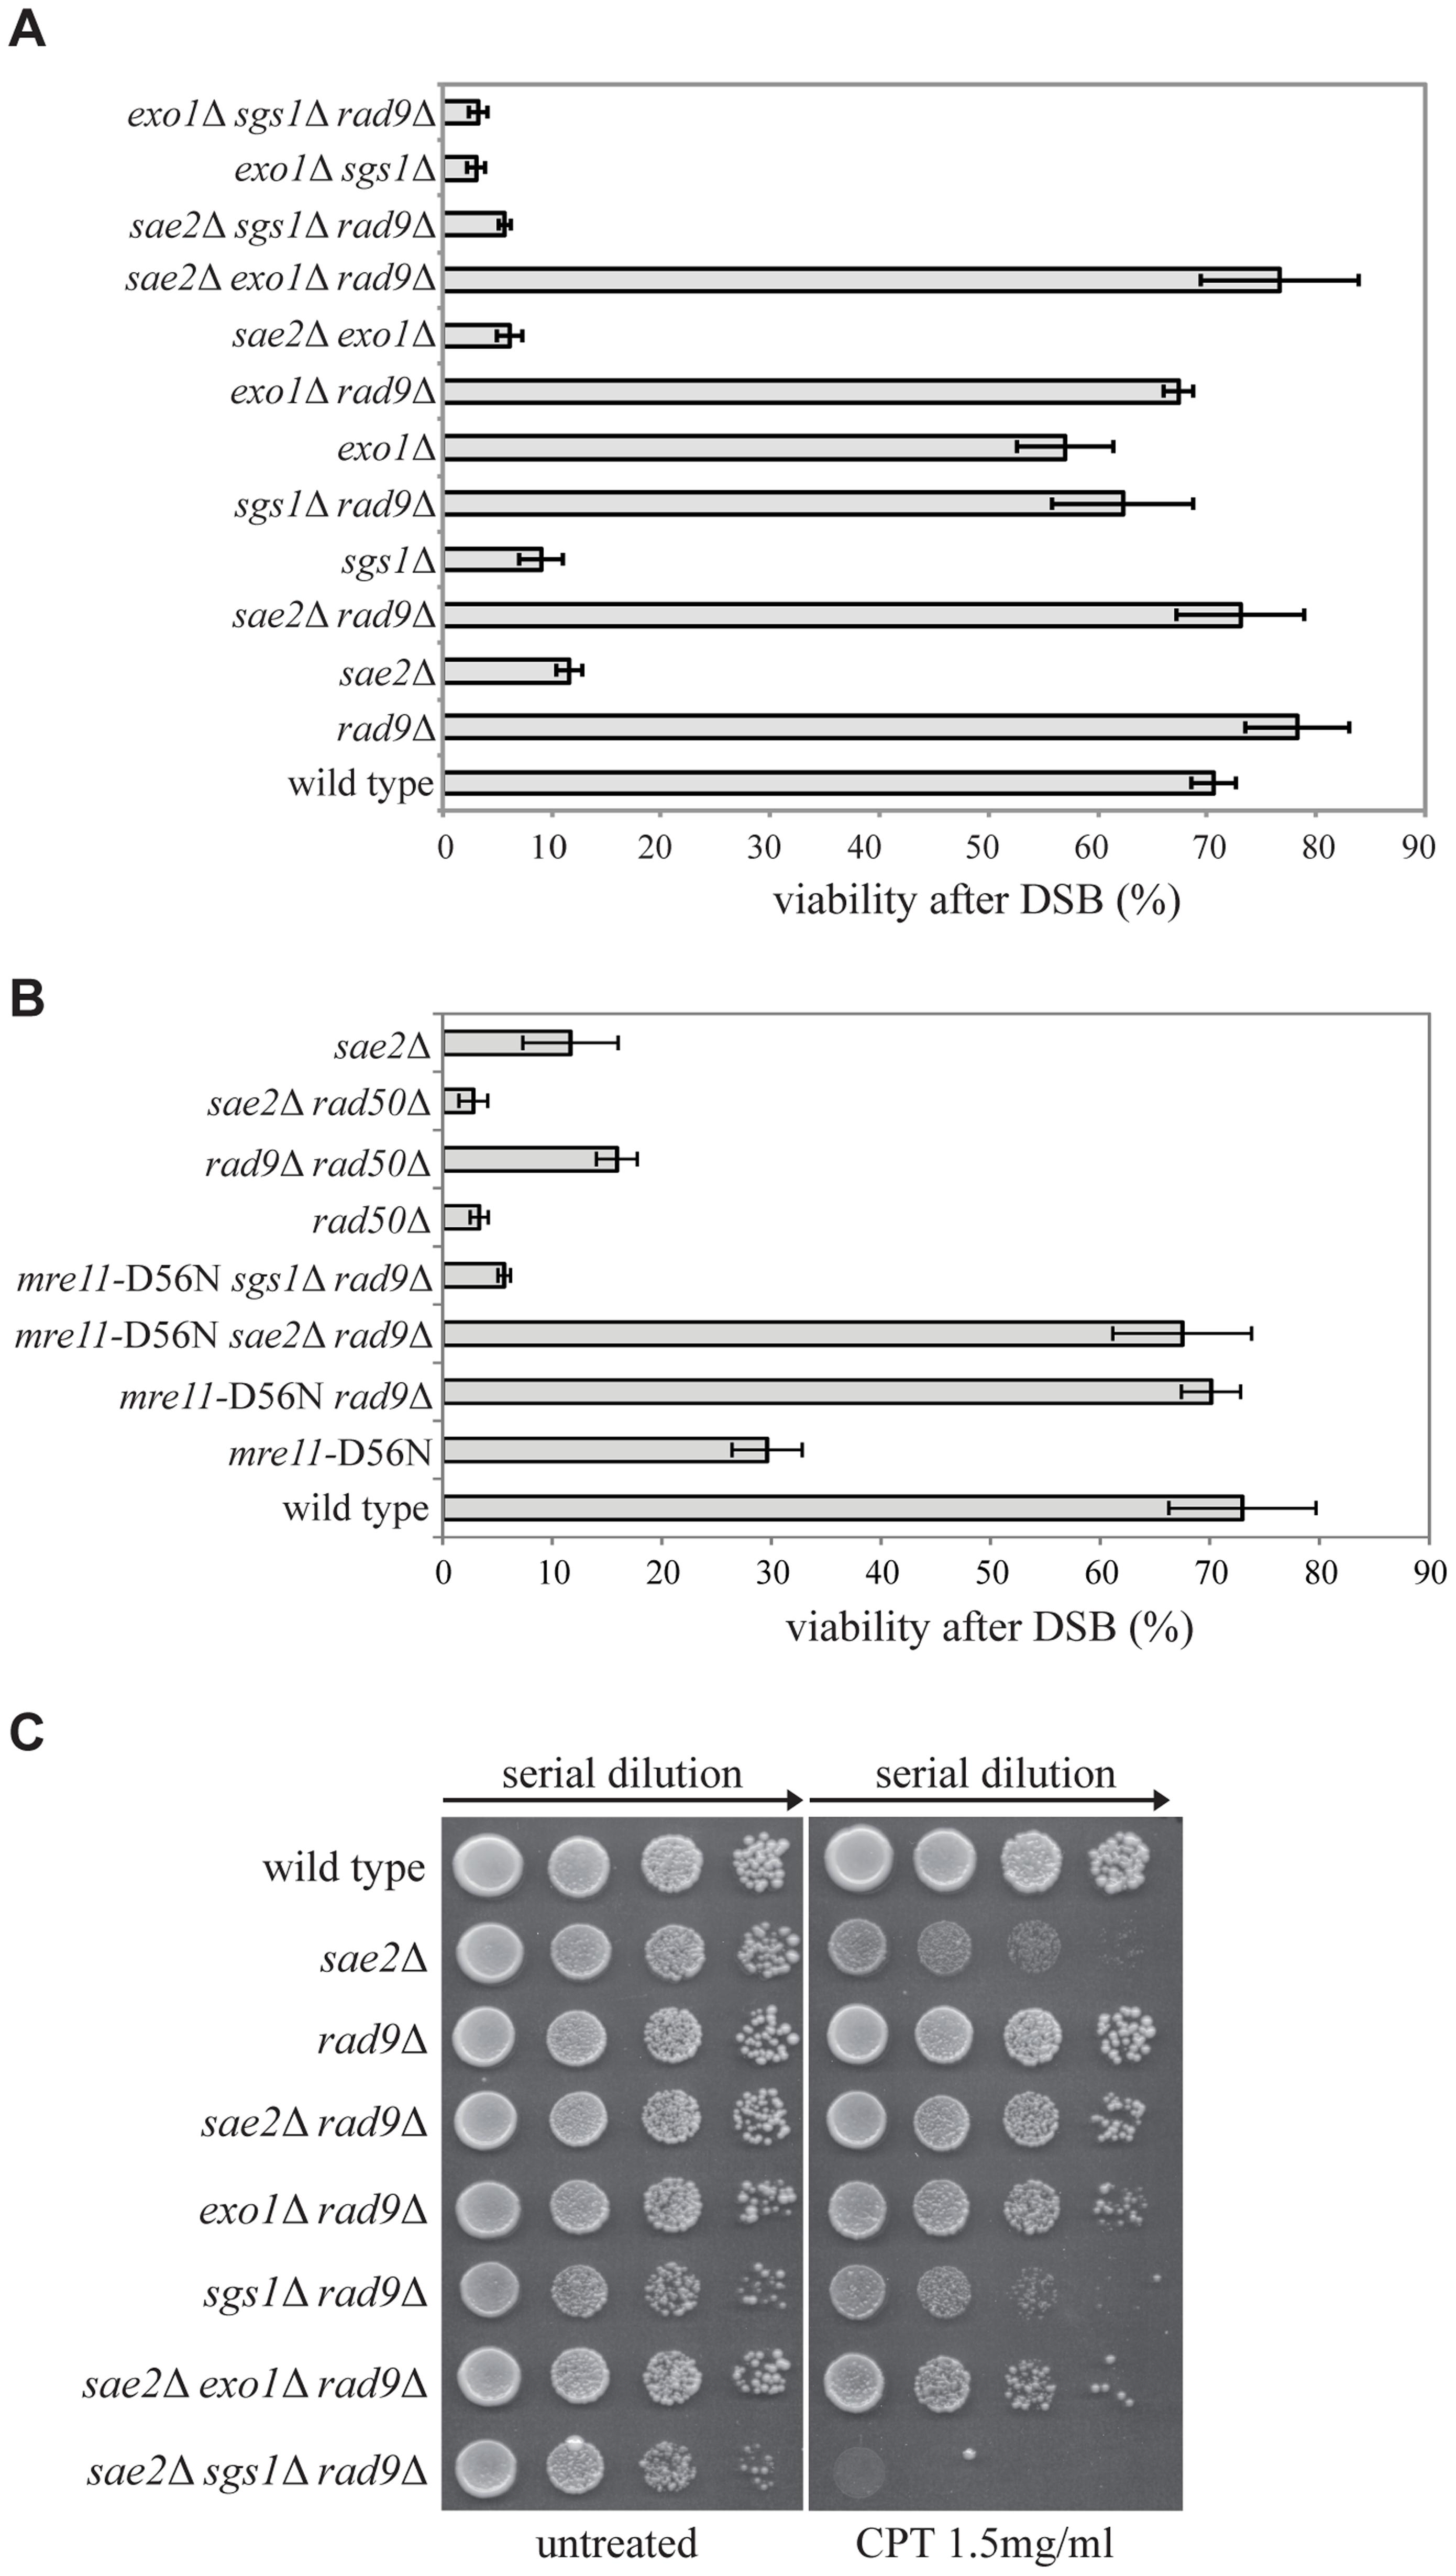 Deletion of <i>RAD9</i> rescues <i>sae2</i>Δ and <i>mre11</i>-D56N cell viability following DSBs through <i>SGS1</i>.